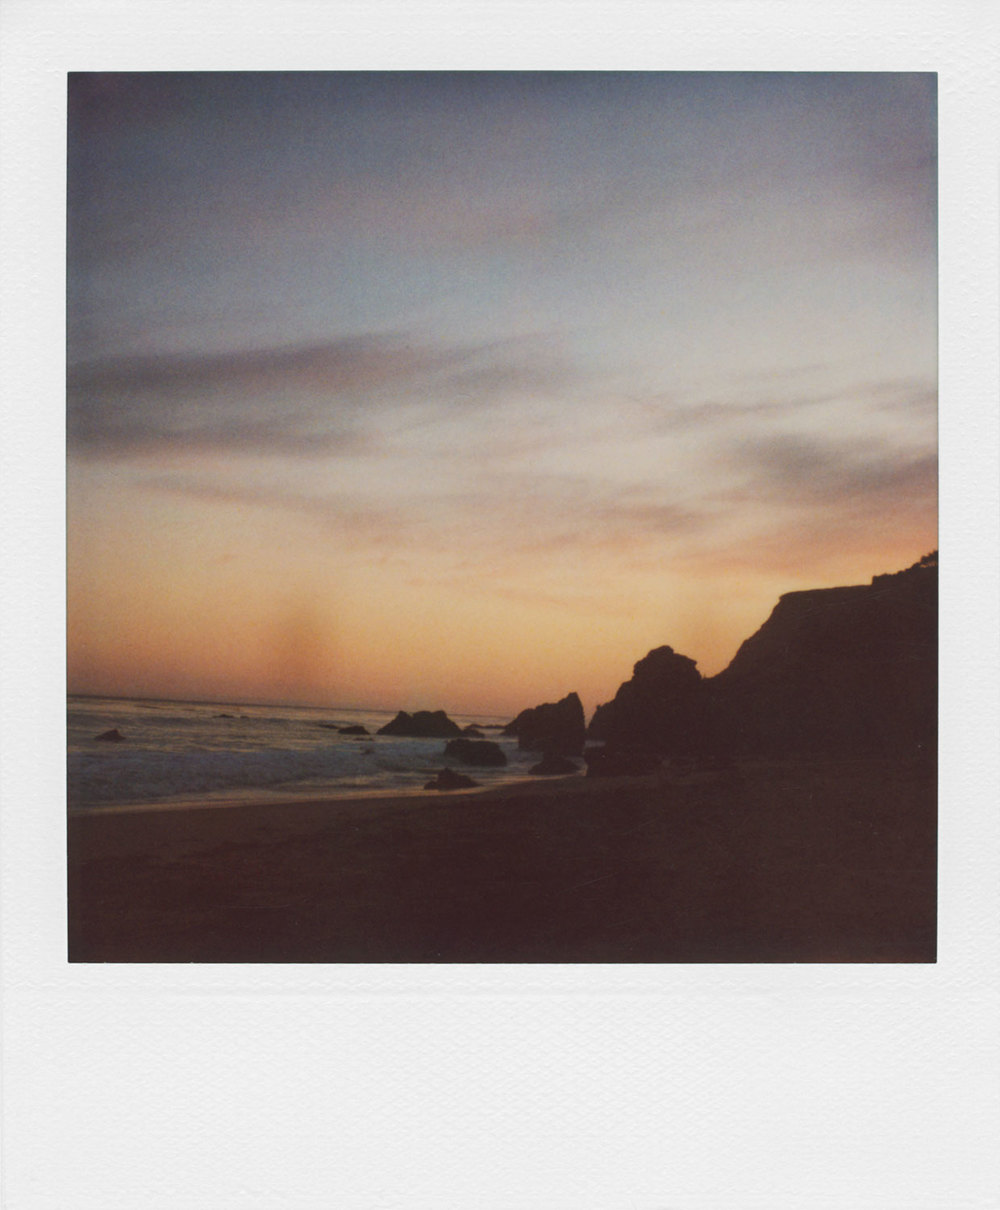 polaroid-10.jpg